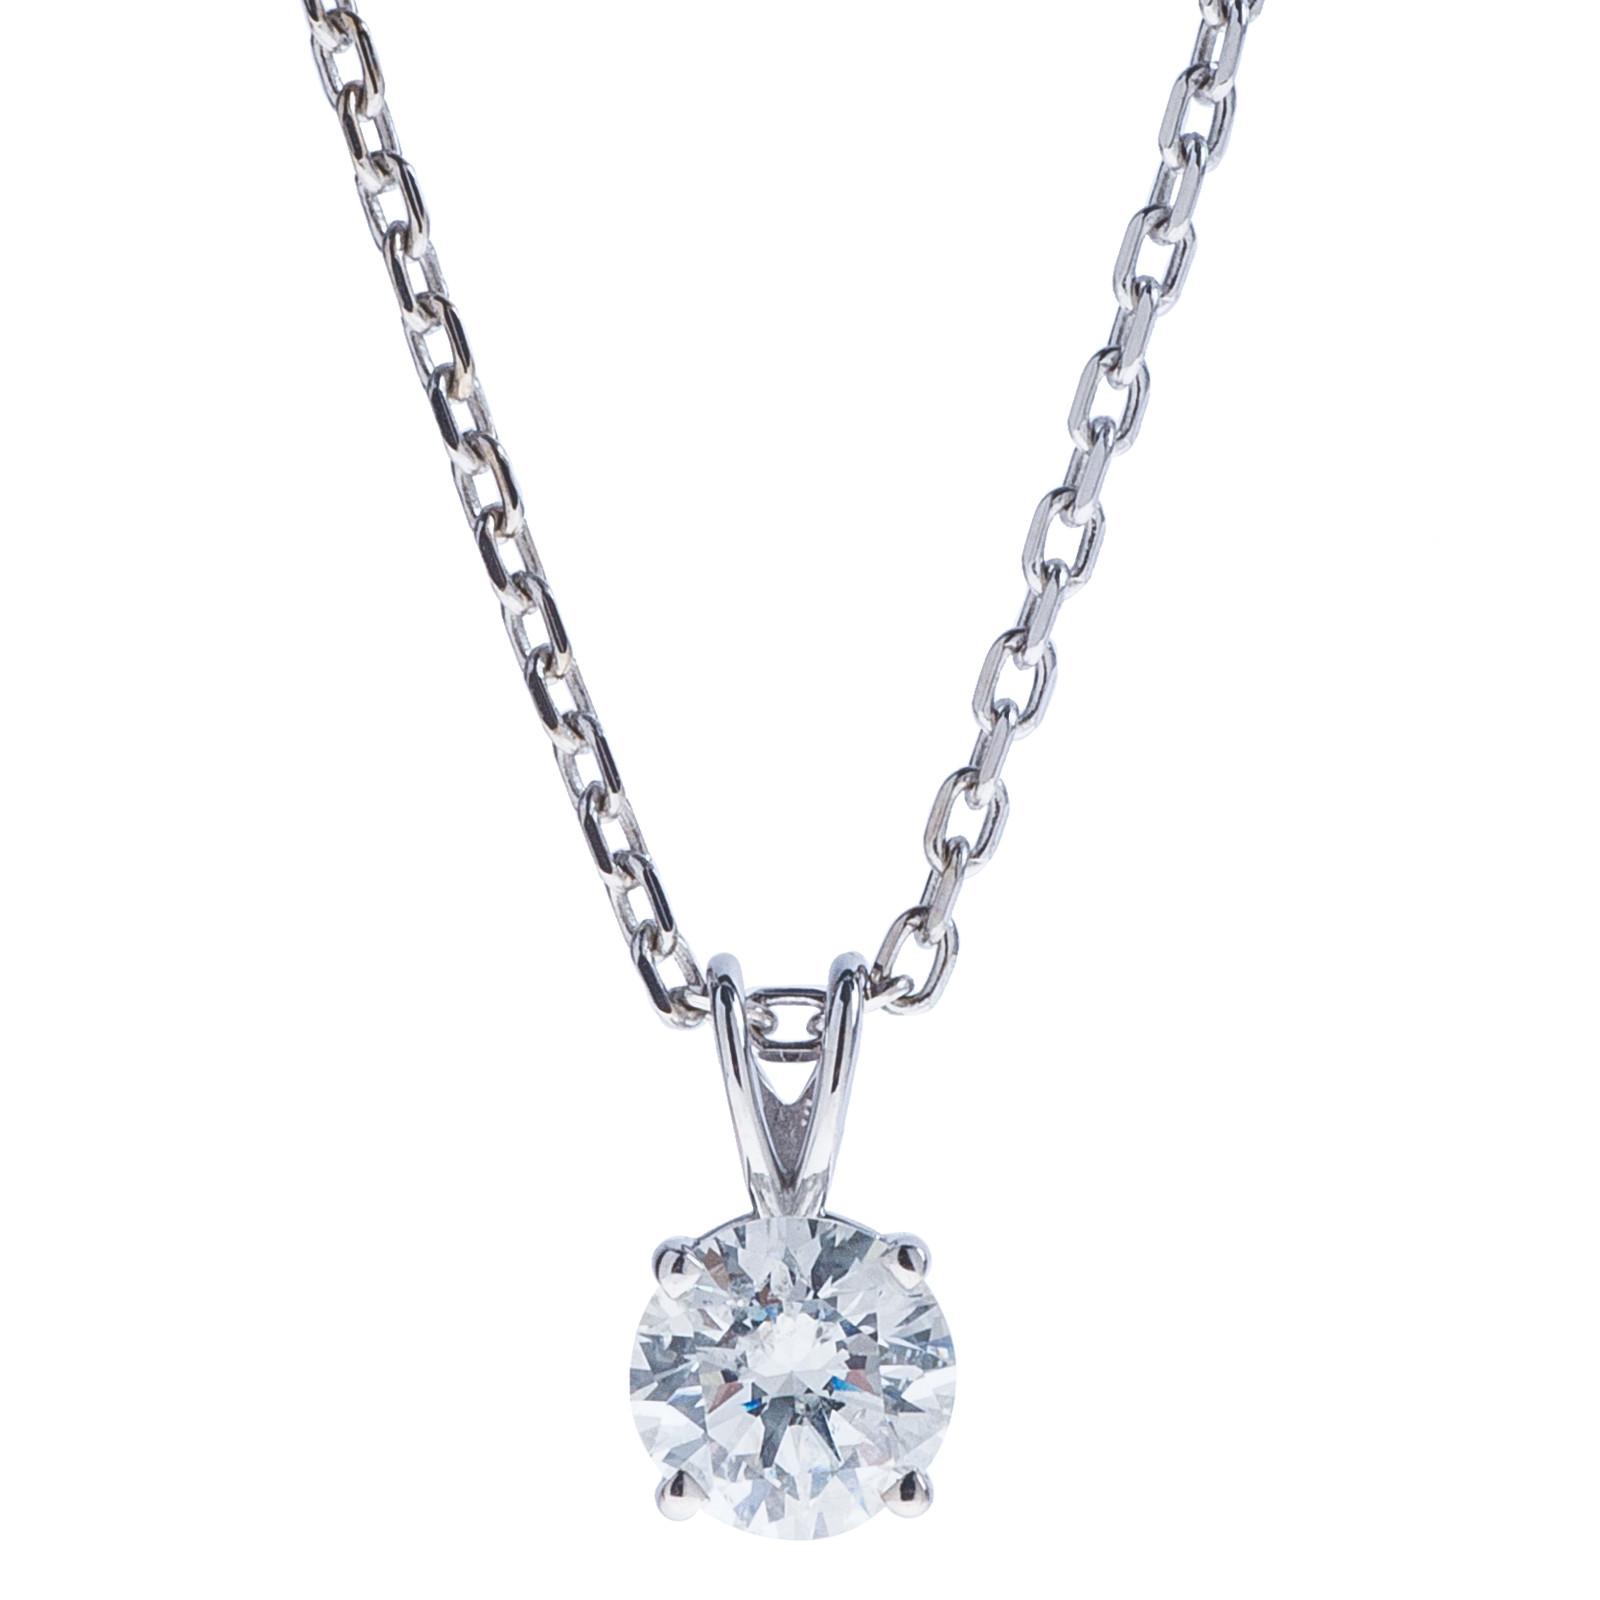 0.74 CT Diamond Pendant